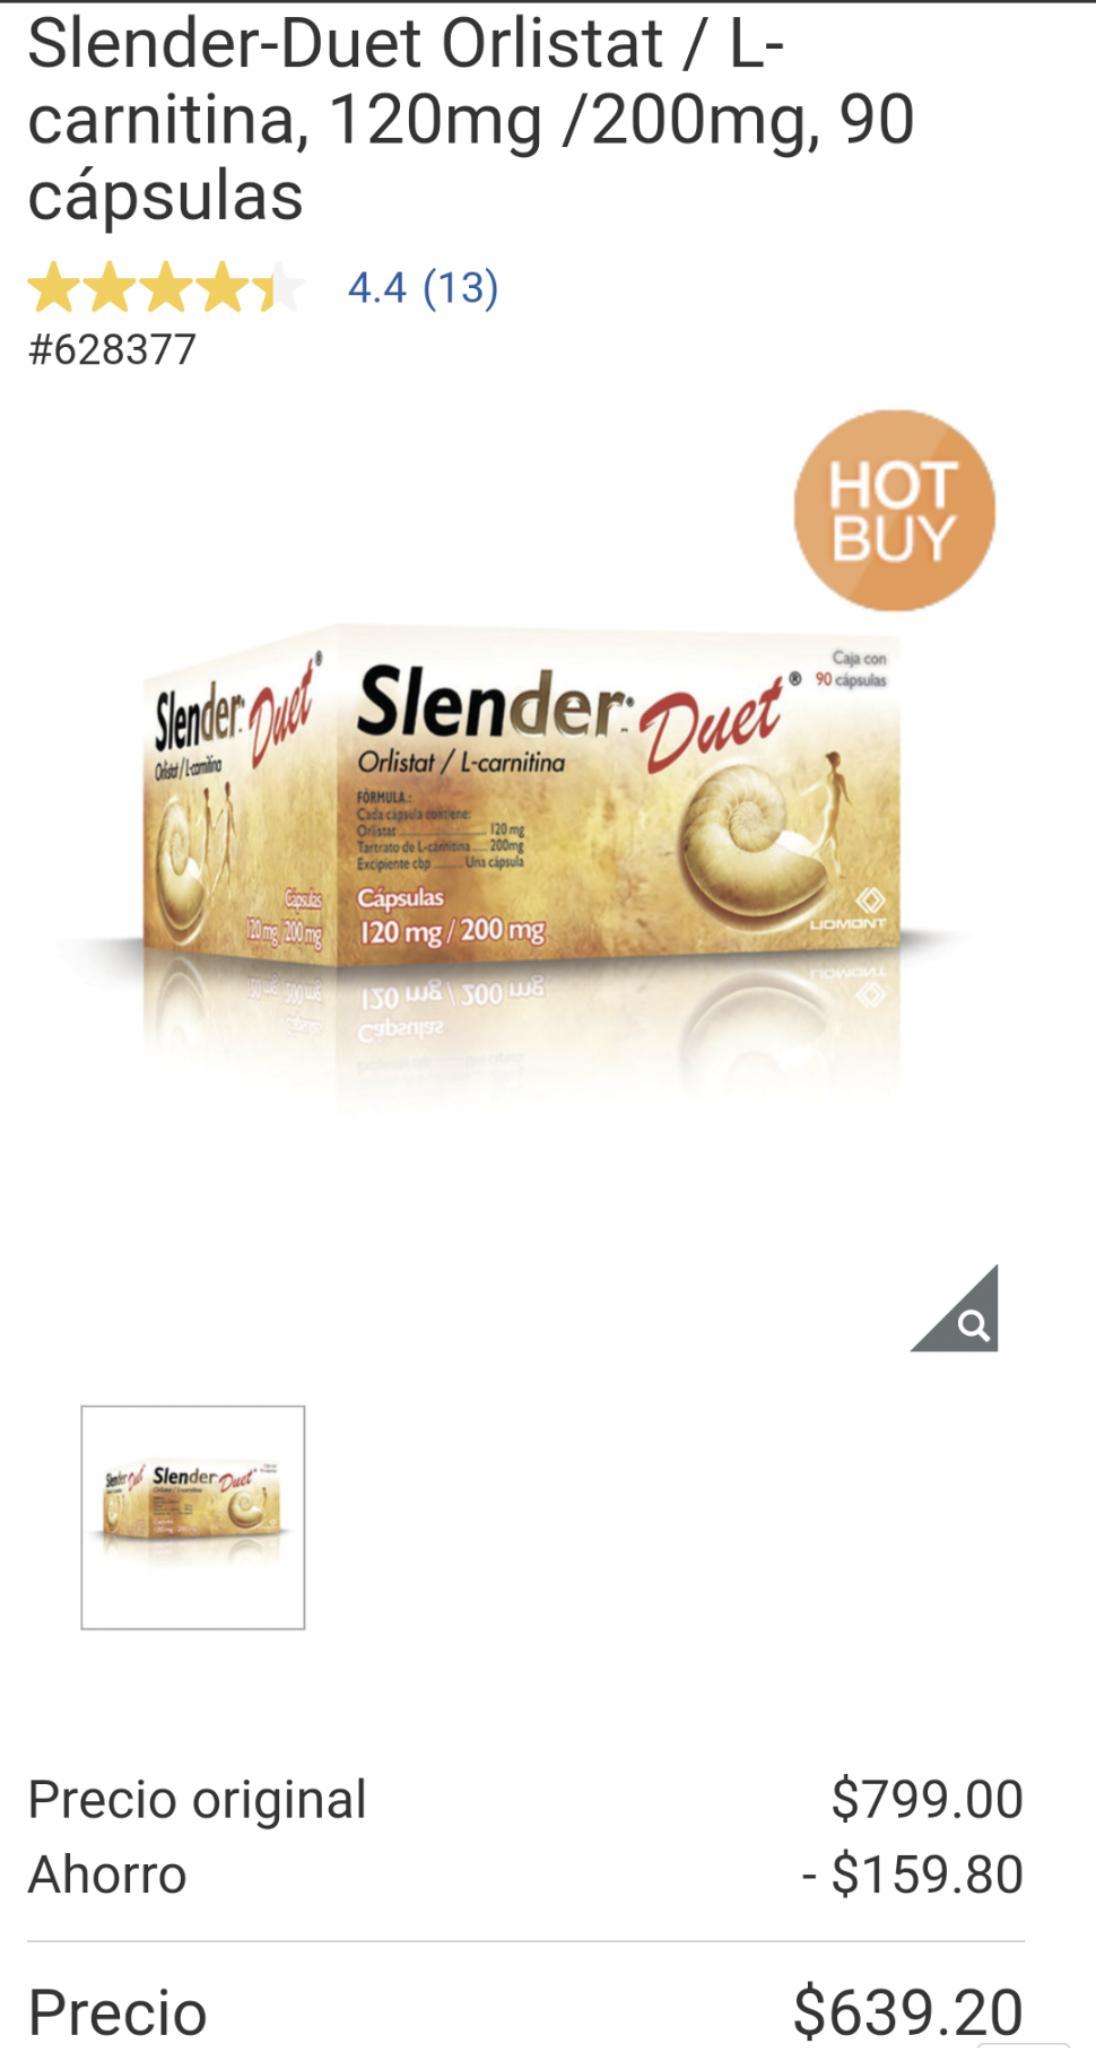 Costco: Slender-Duet Orlistat a súper precio